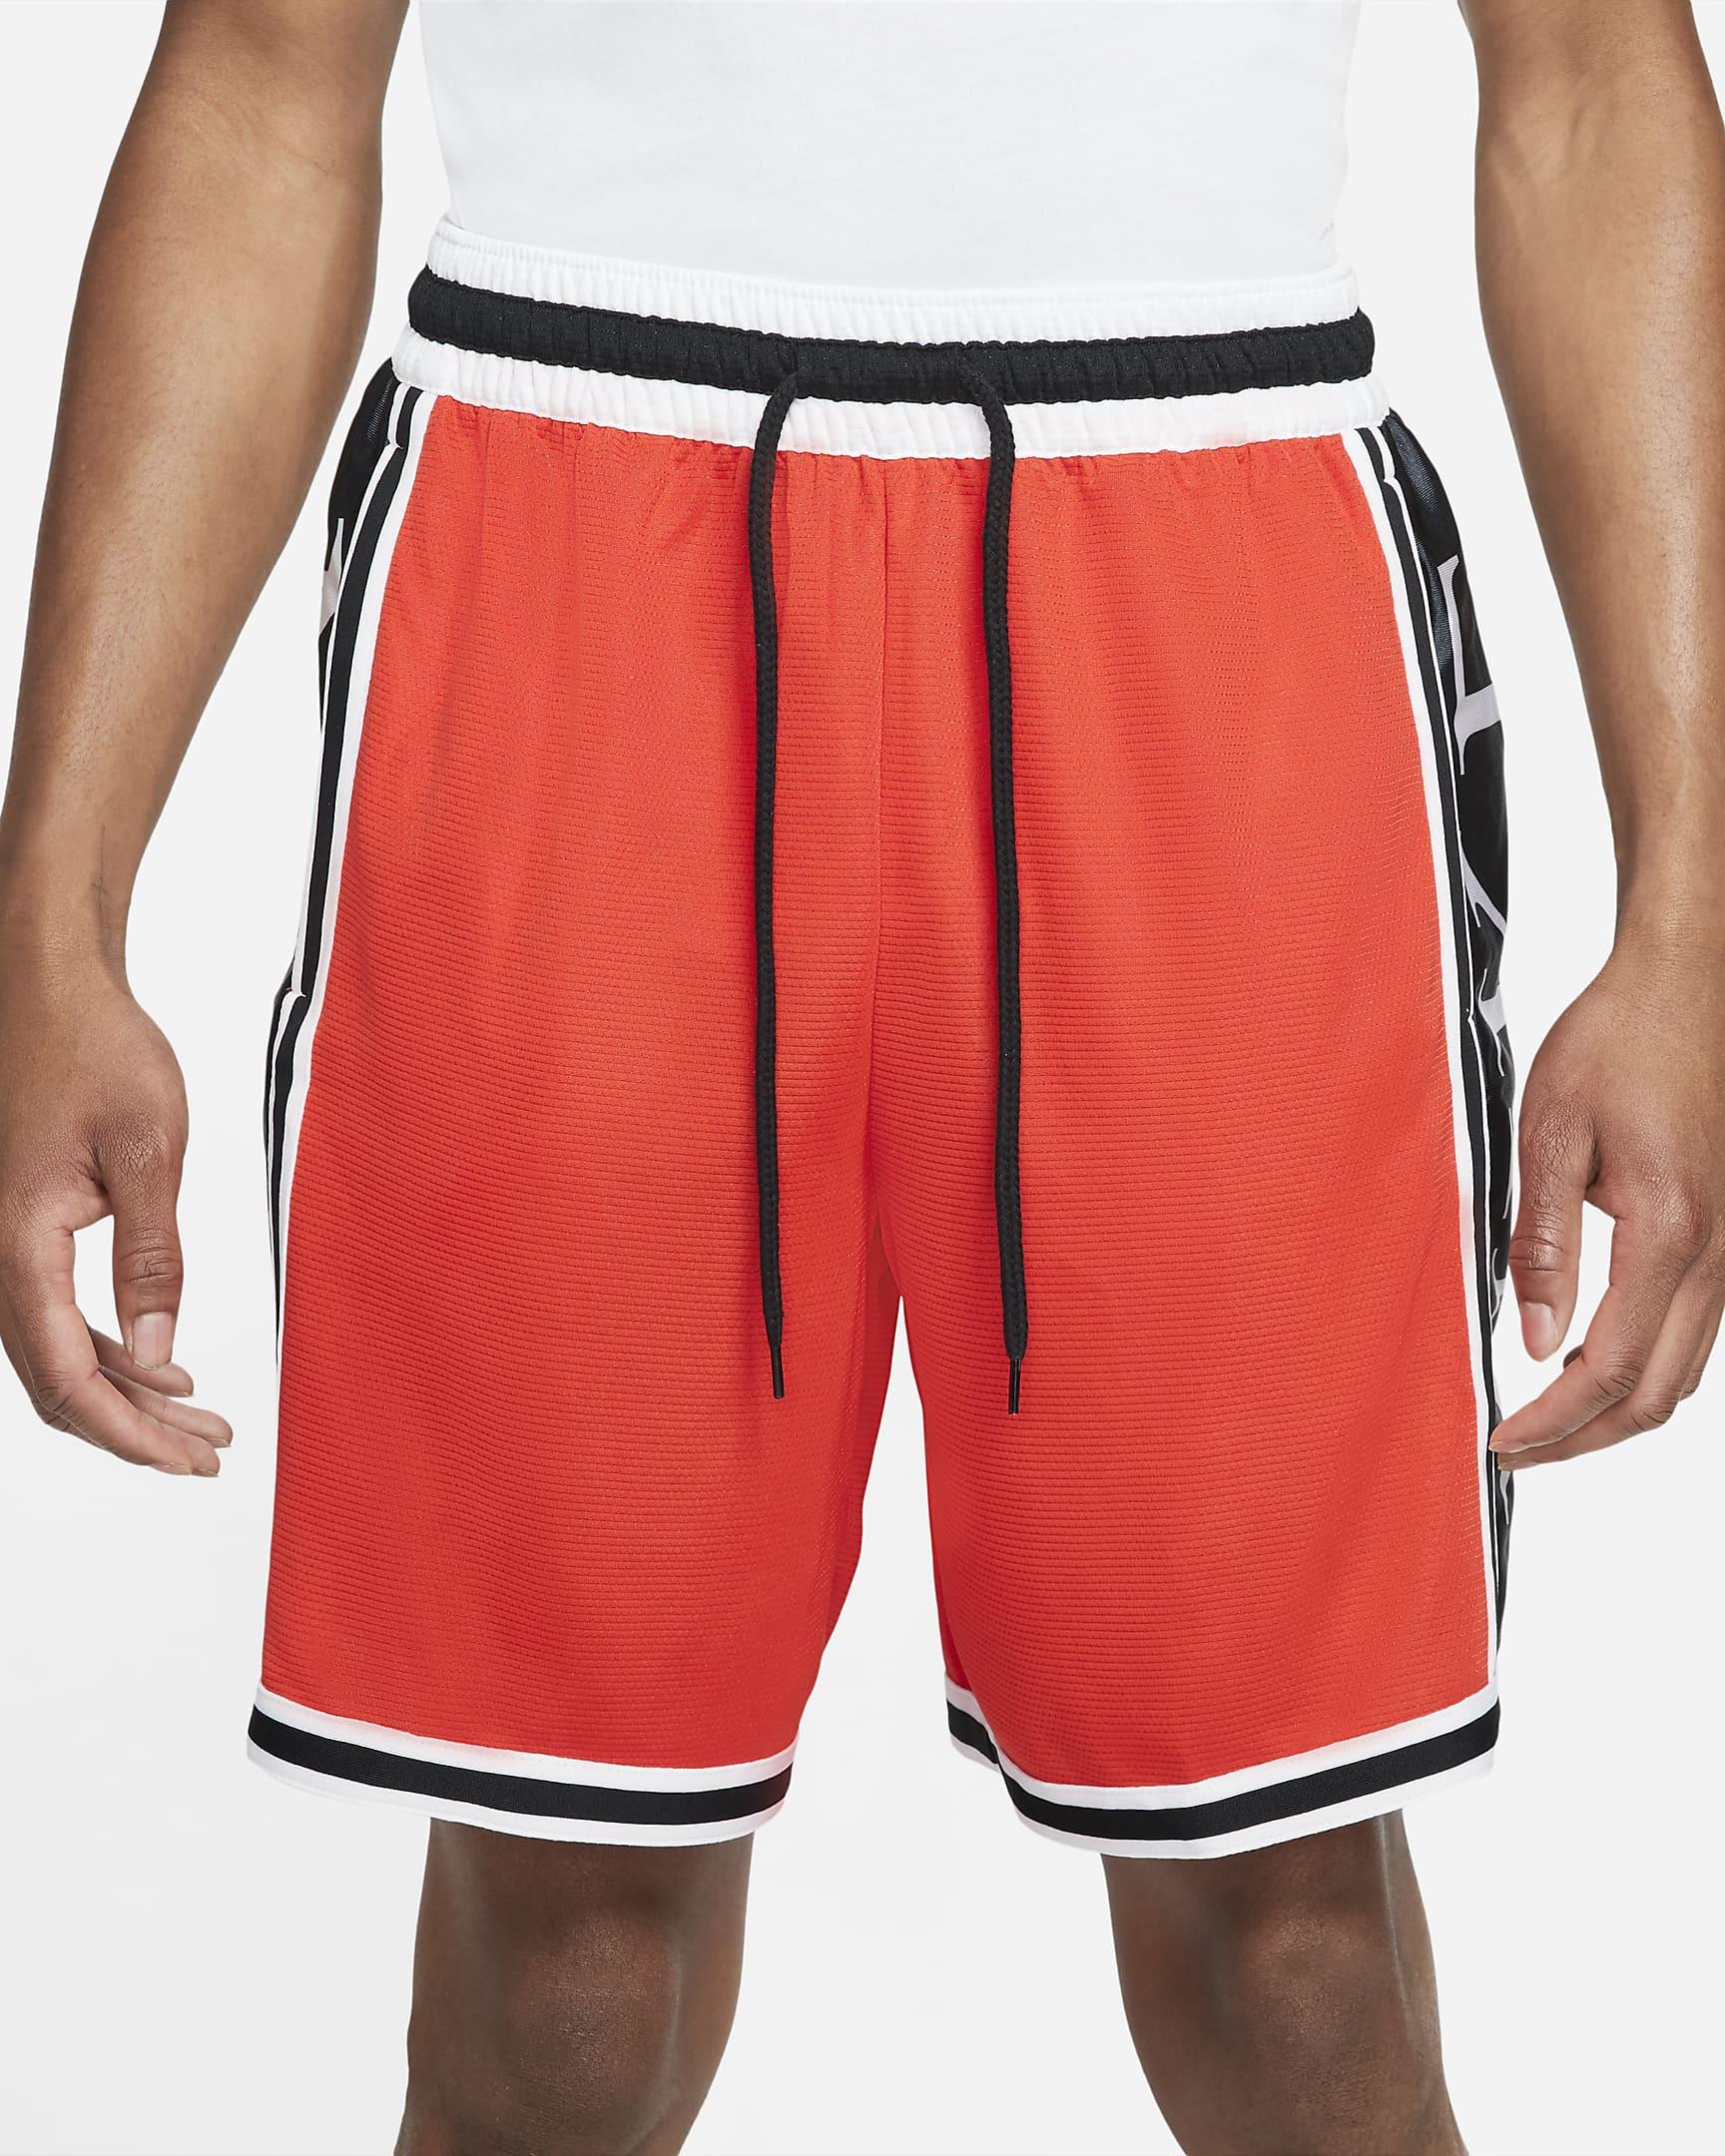 nike-dri-fit-dna-mens-basketball-shorts-j7lxtC.png